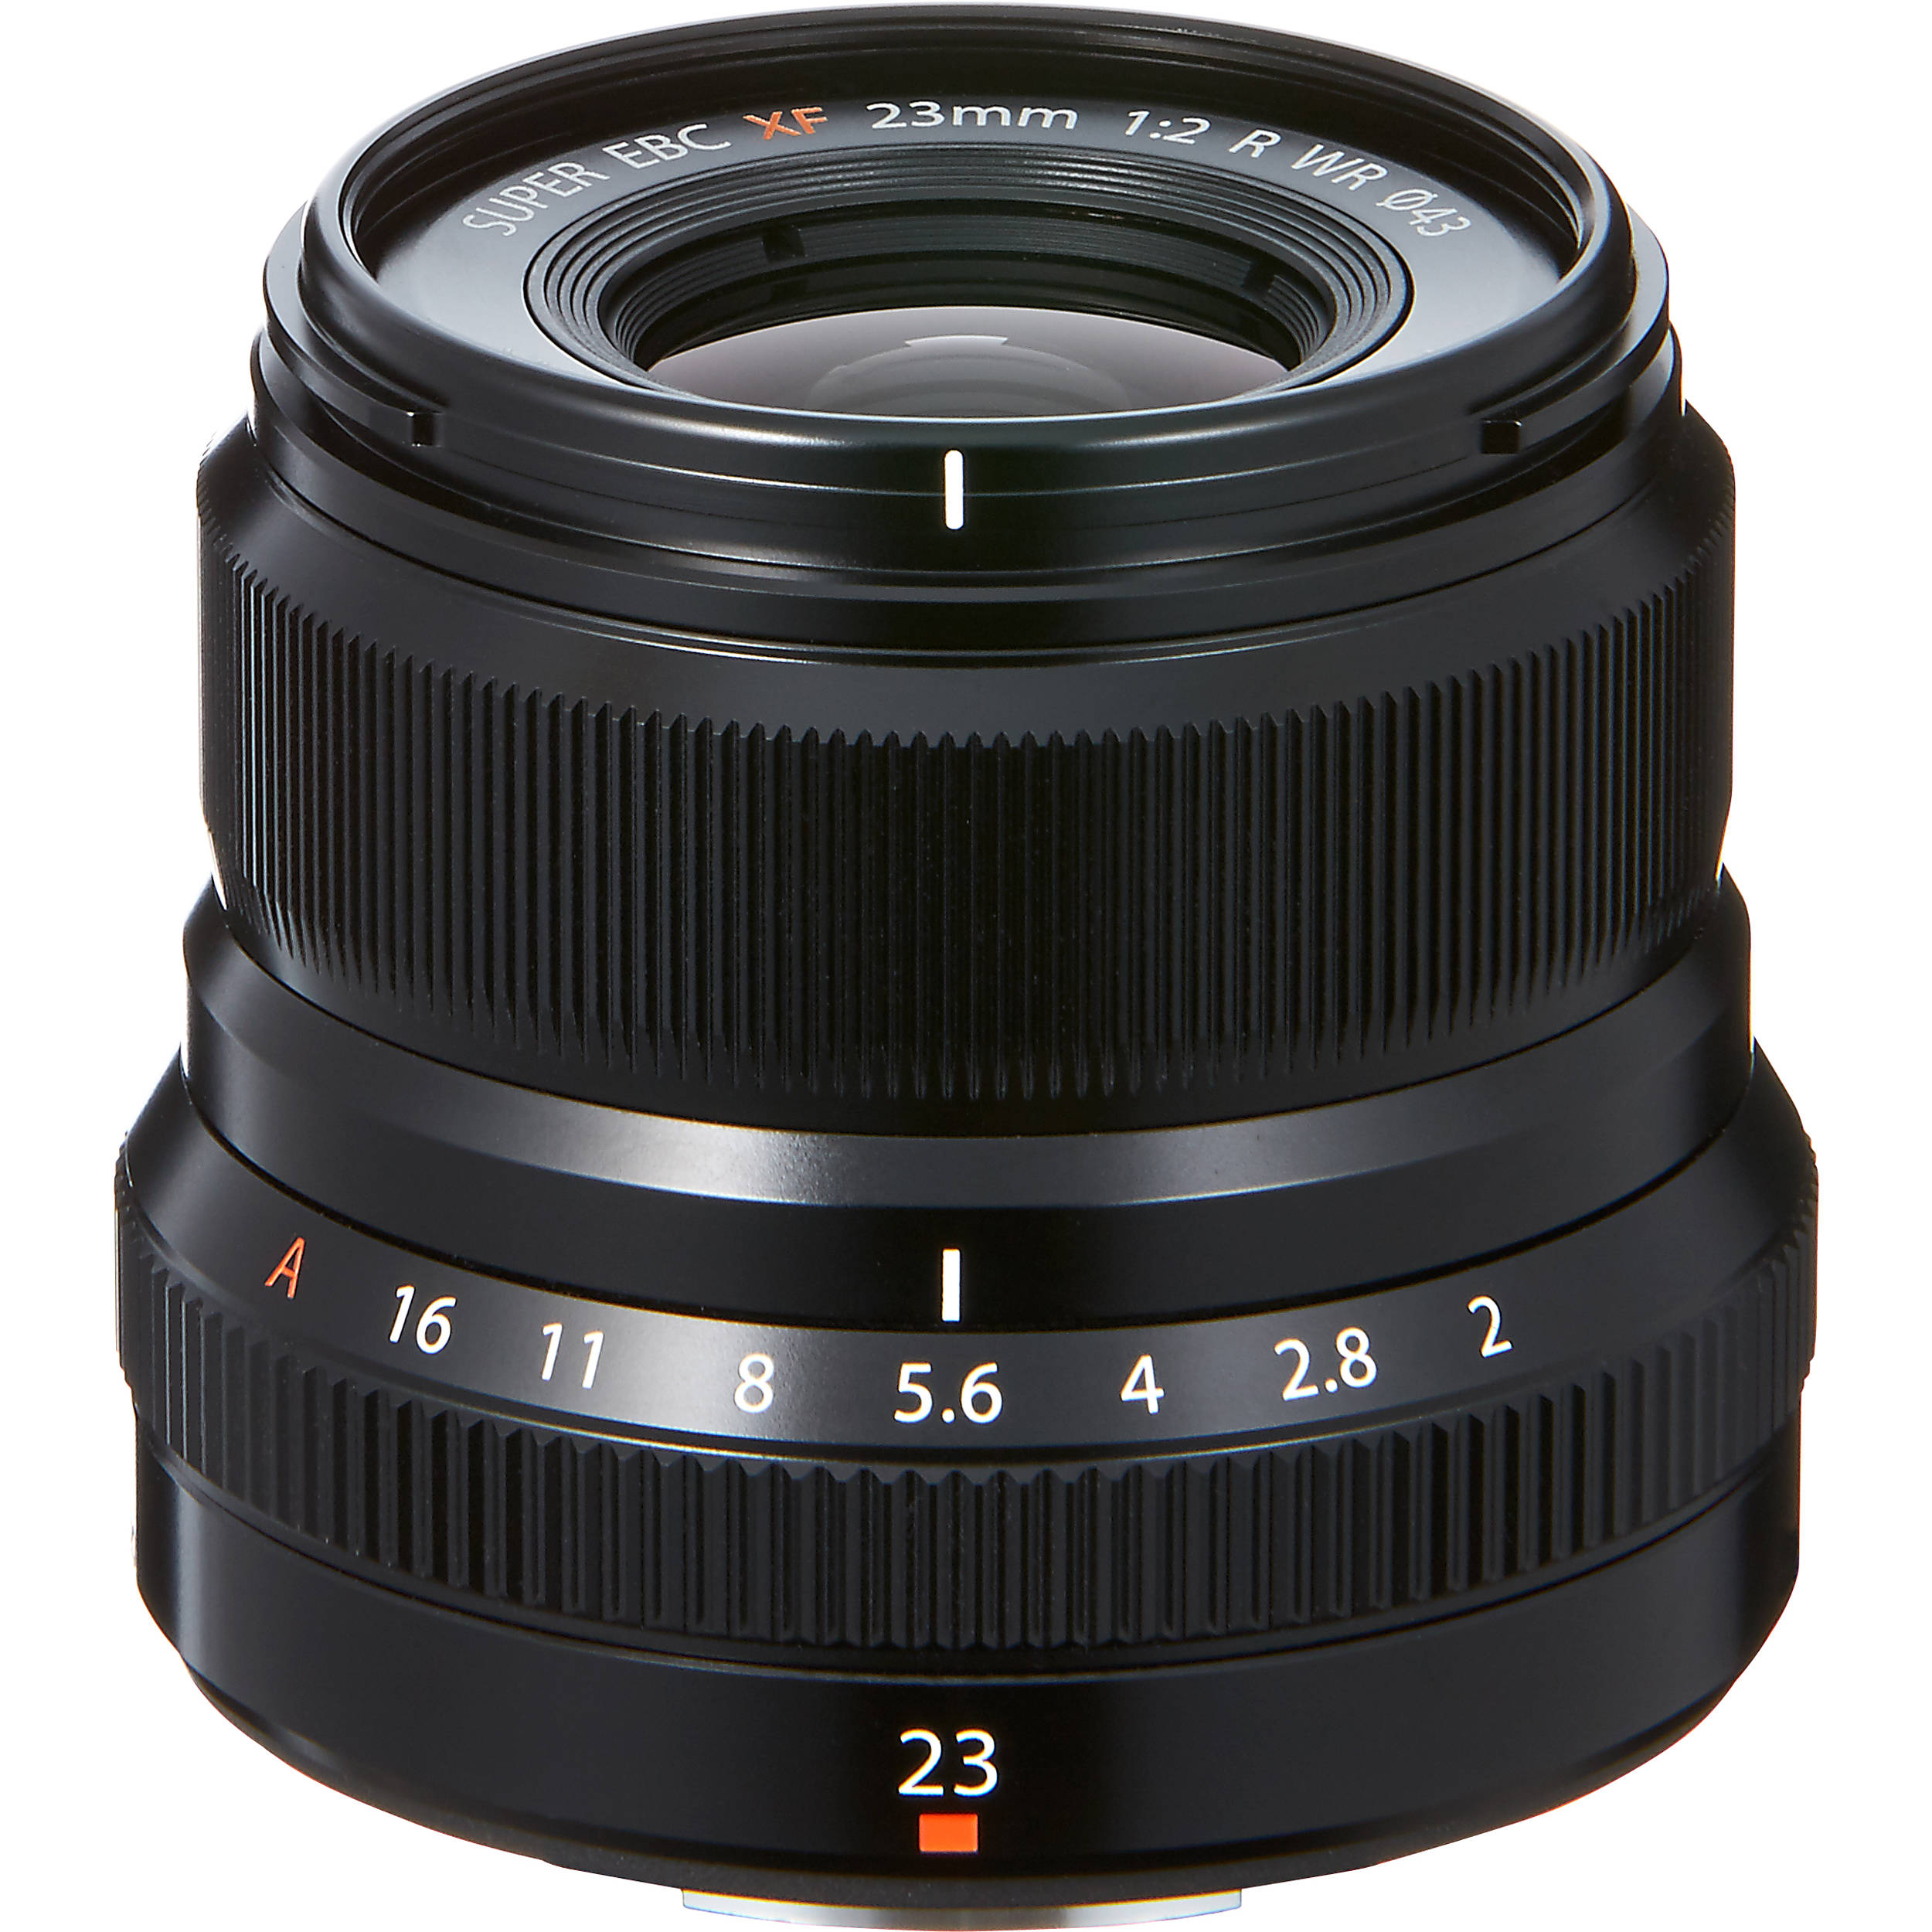 Fujifilm Fujinon XF 23mm f/2,0 WR Svart